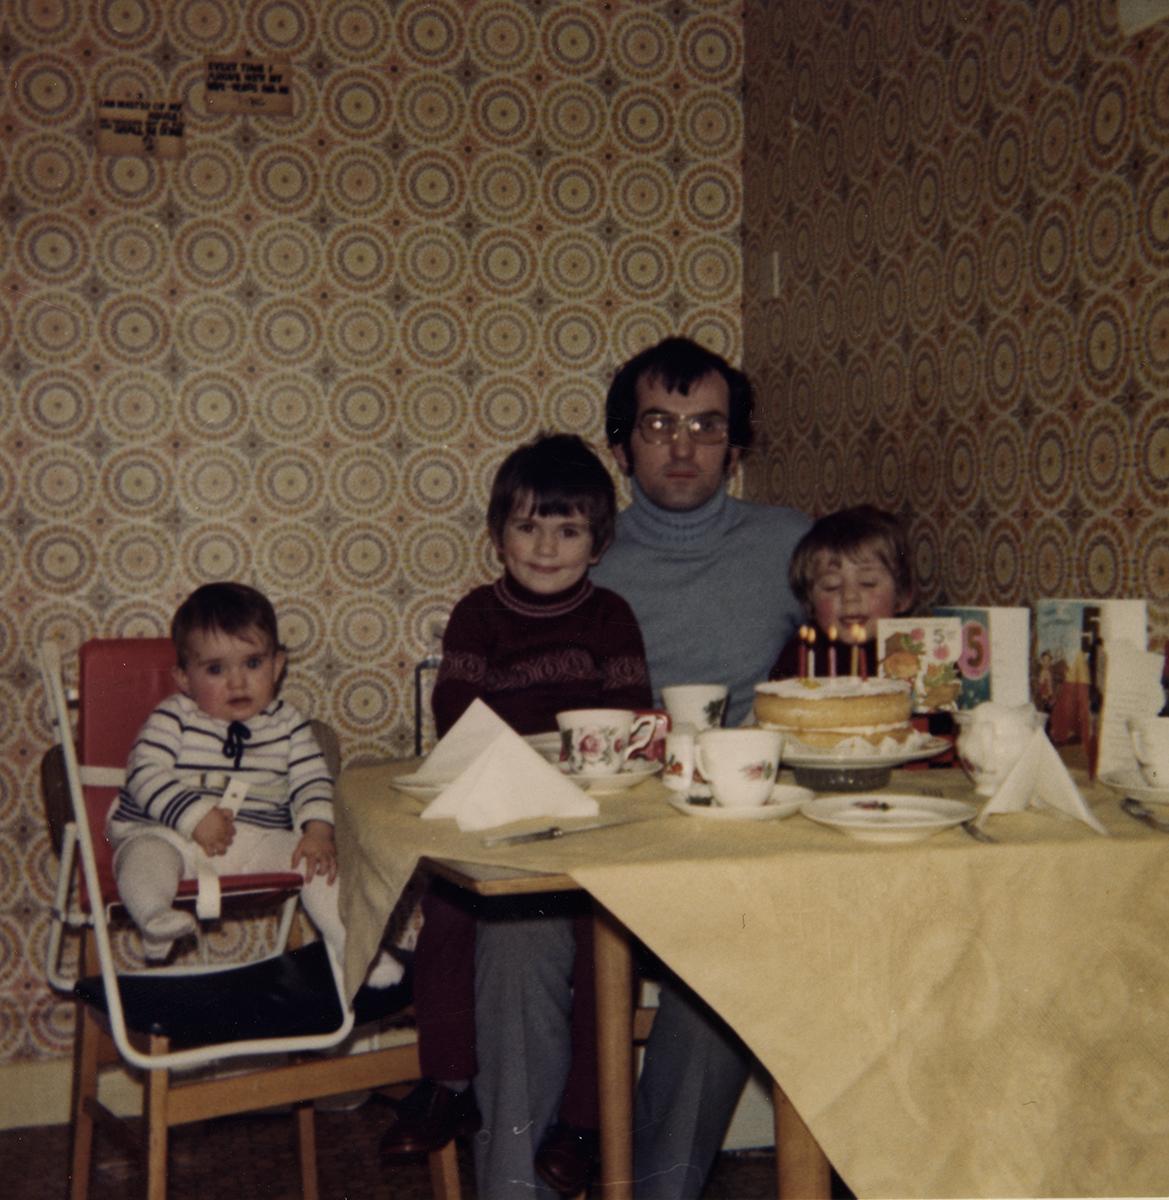 Shanahan // County Dublin :: Family in Kitchen